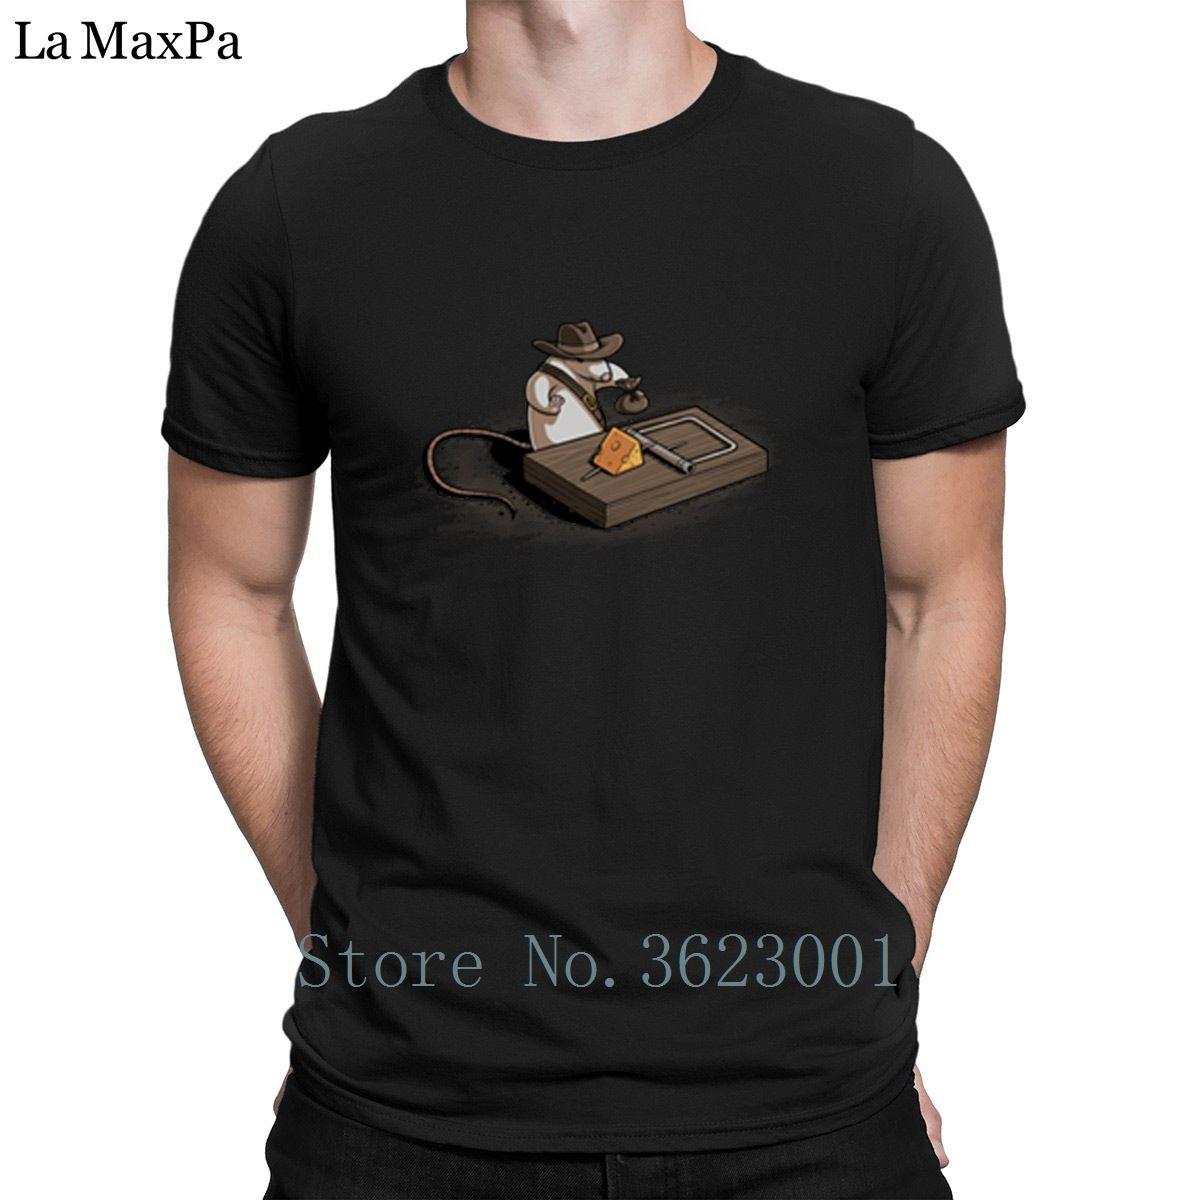 c9e00161ef7c2 Customize Cotton Men S Tee Shirt Indiana Mouse T Shirt Man Humorous Funny  Men Tee Shirt Novelty Men S T Shirt Graphic Clothes Cool T Shirt Sites  White ...